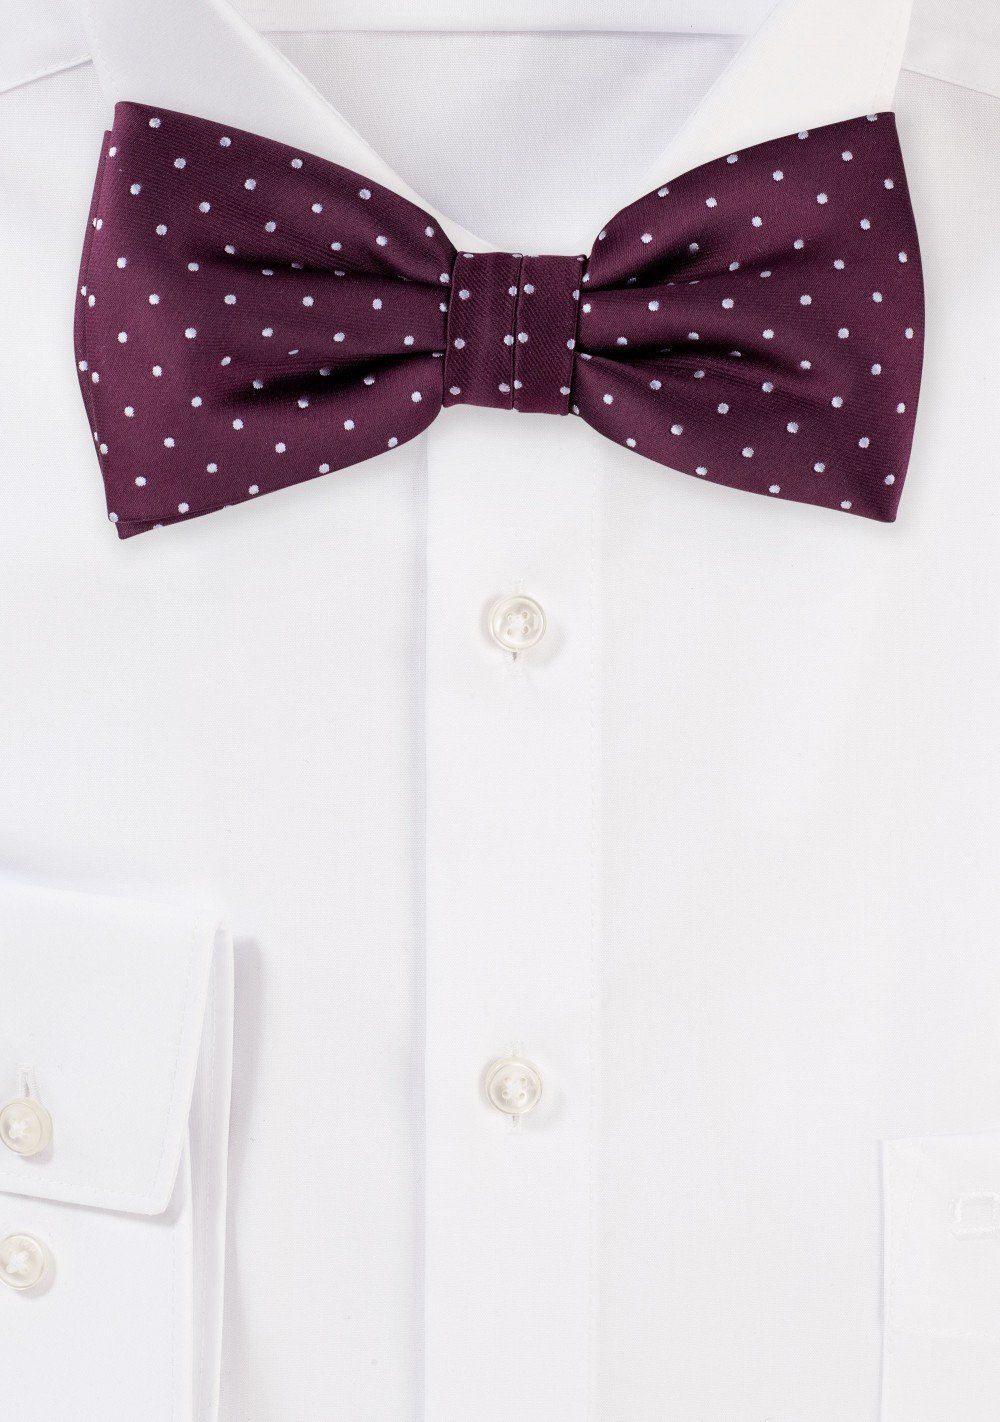 Burgundy Polka Dot Bow Tie